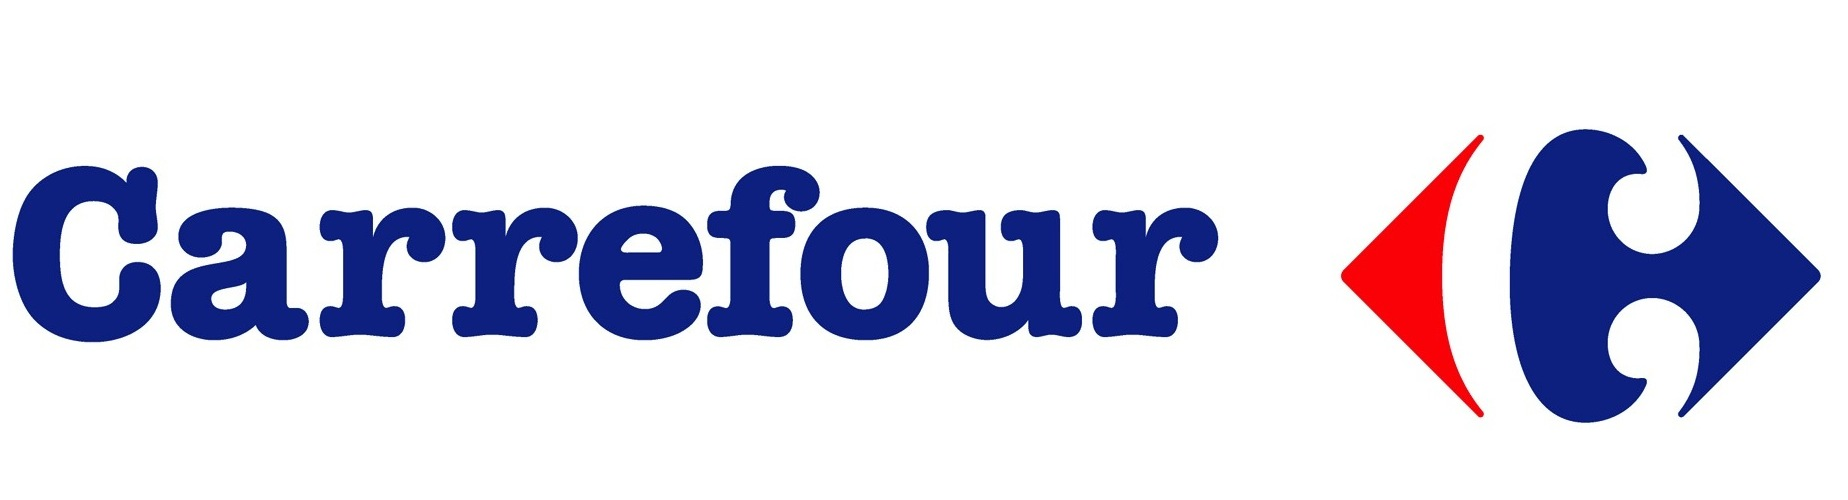 carrefour logo 04 - Carrefour Logo PNG